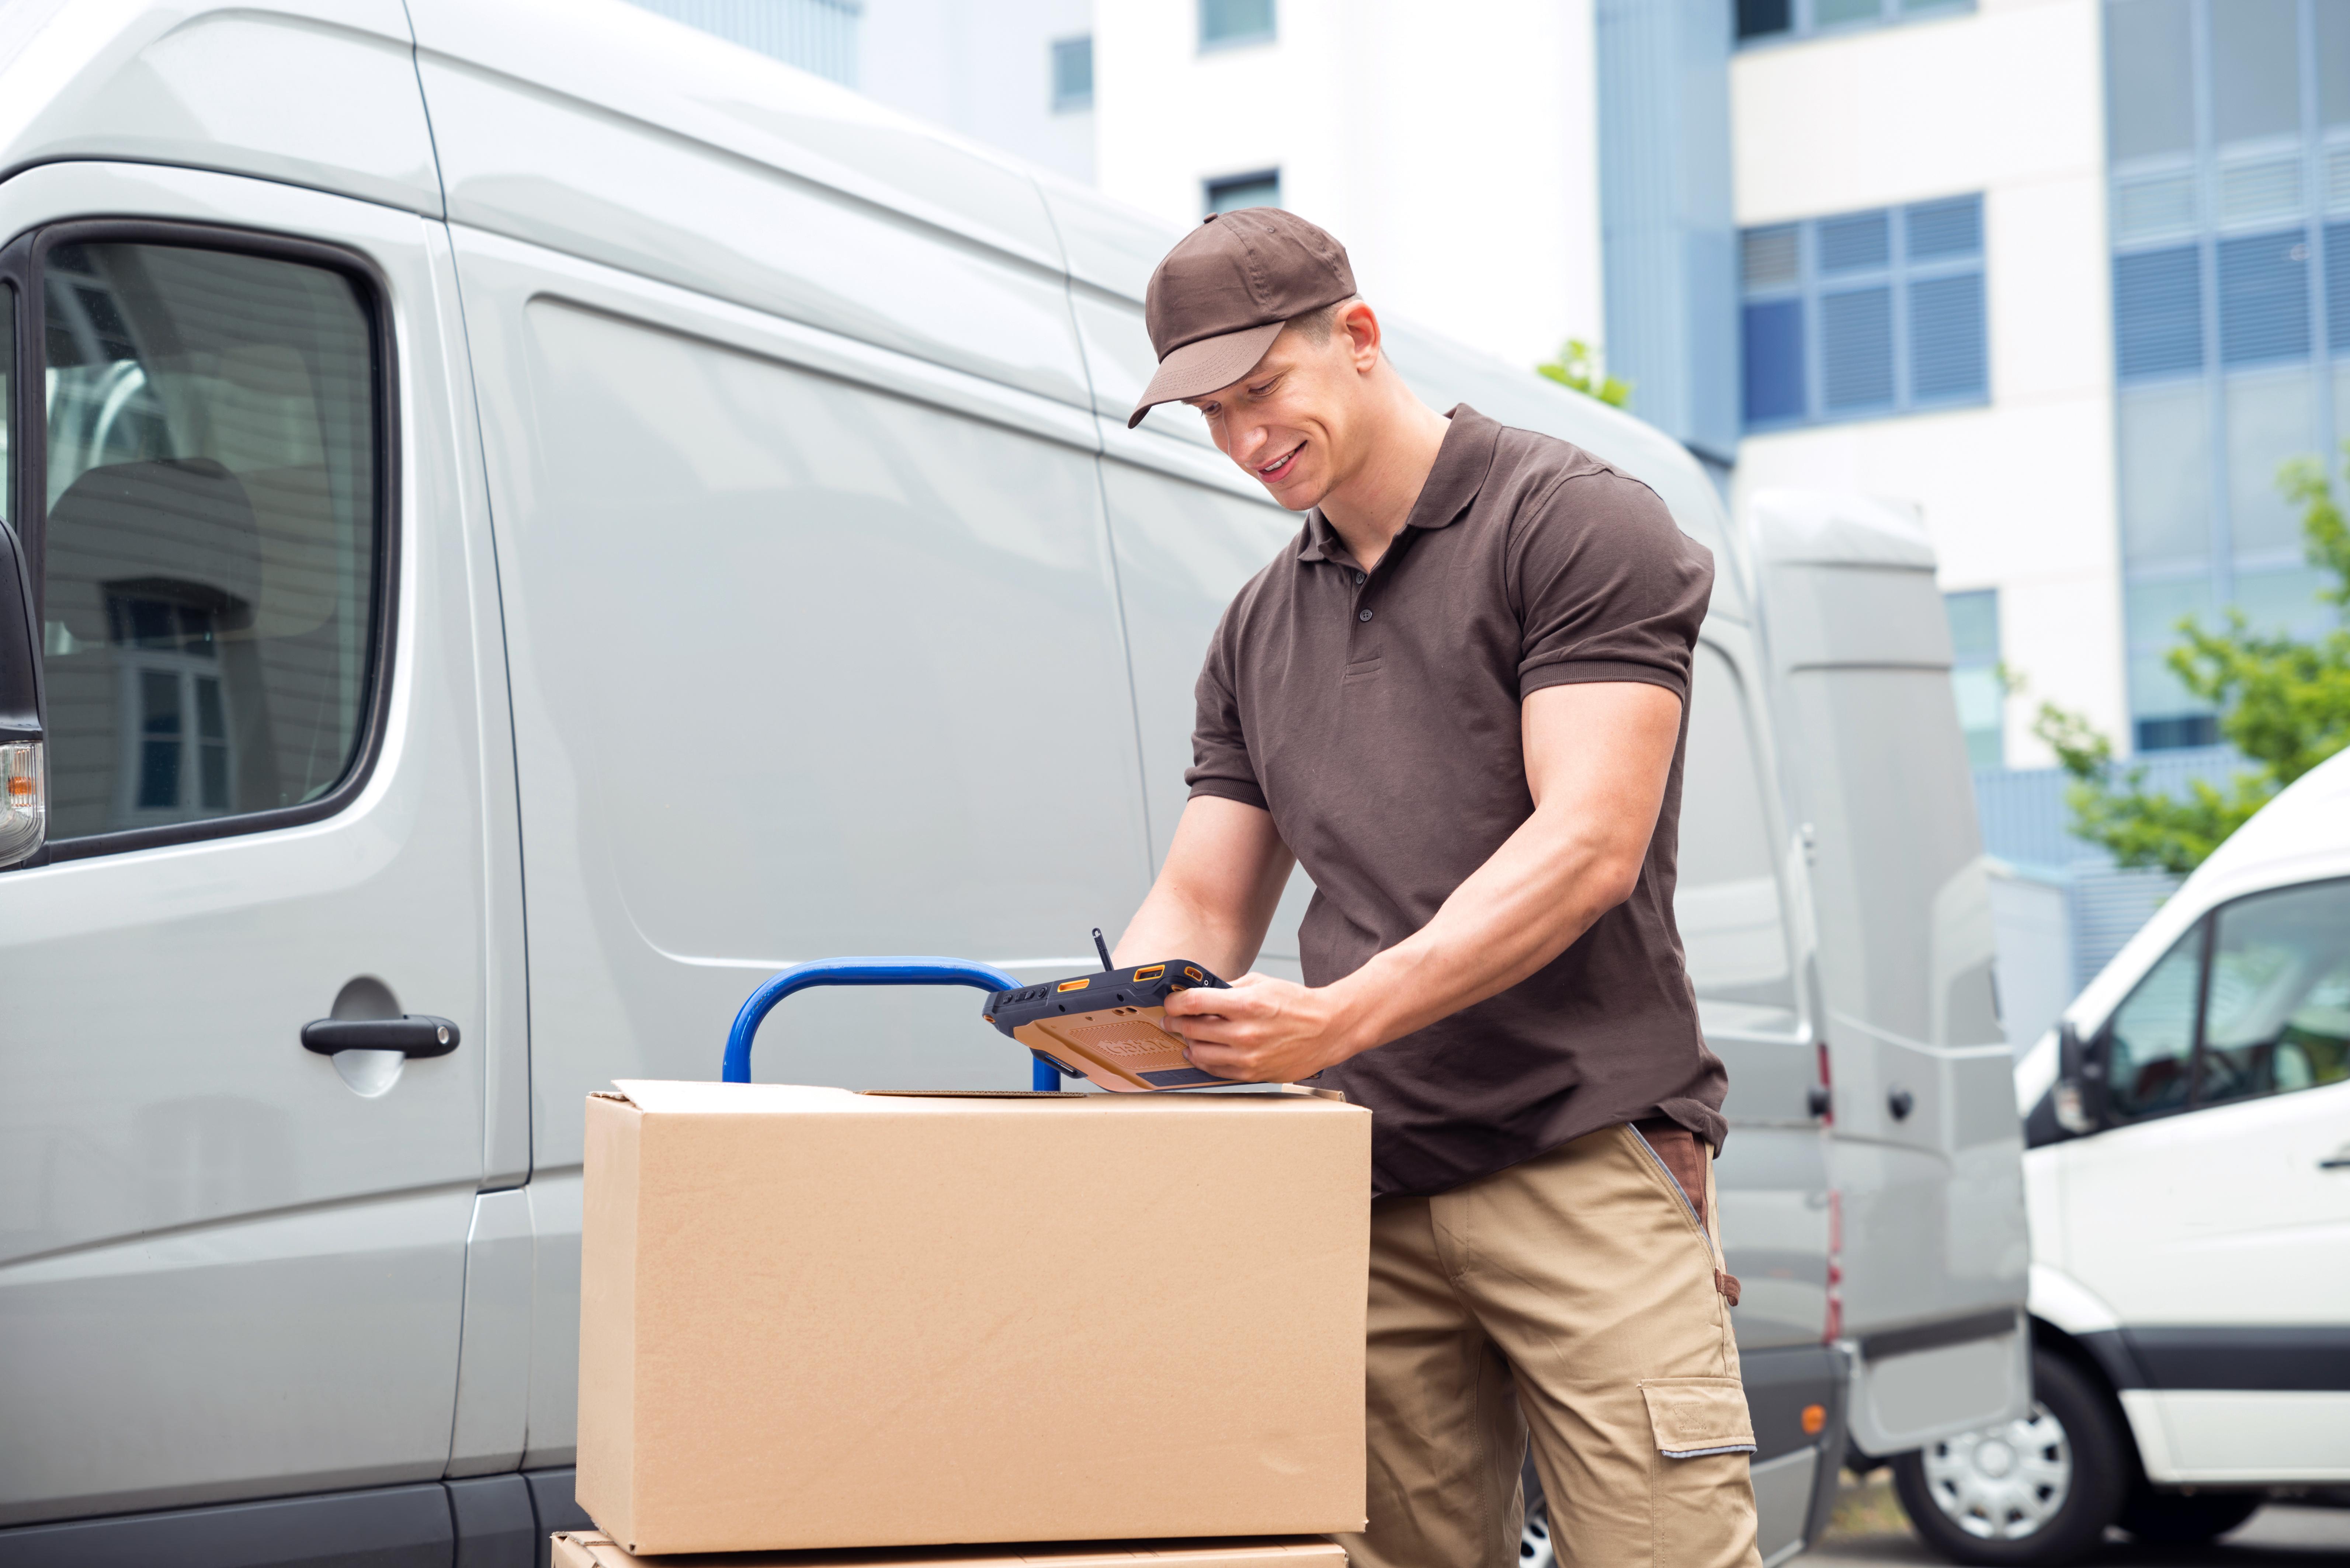 Transportation and Logistics sector